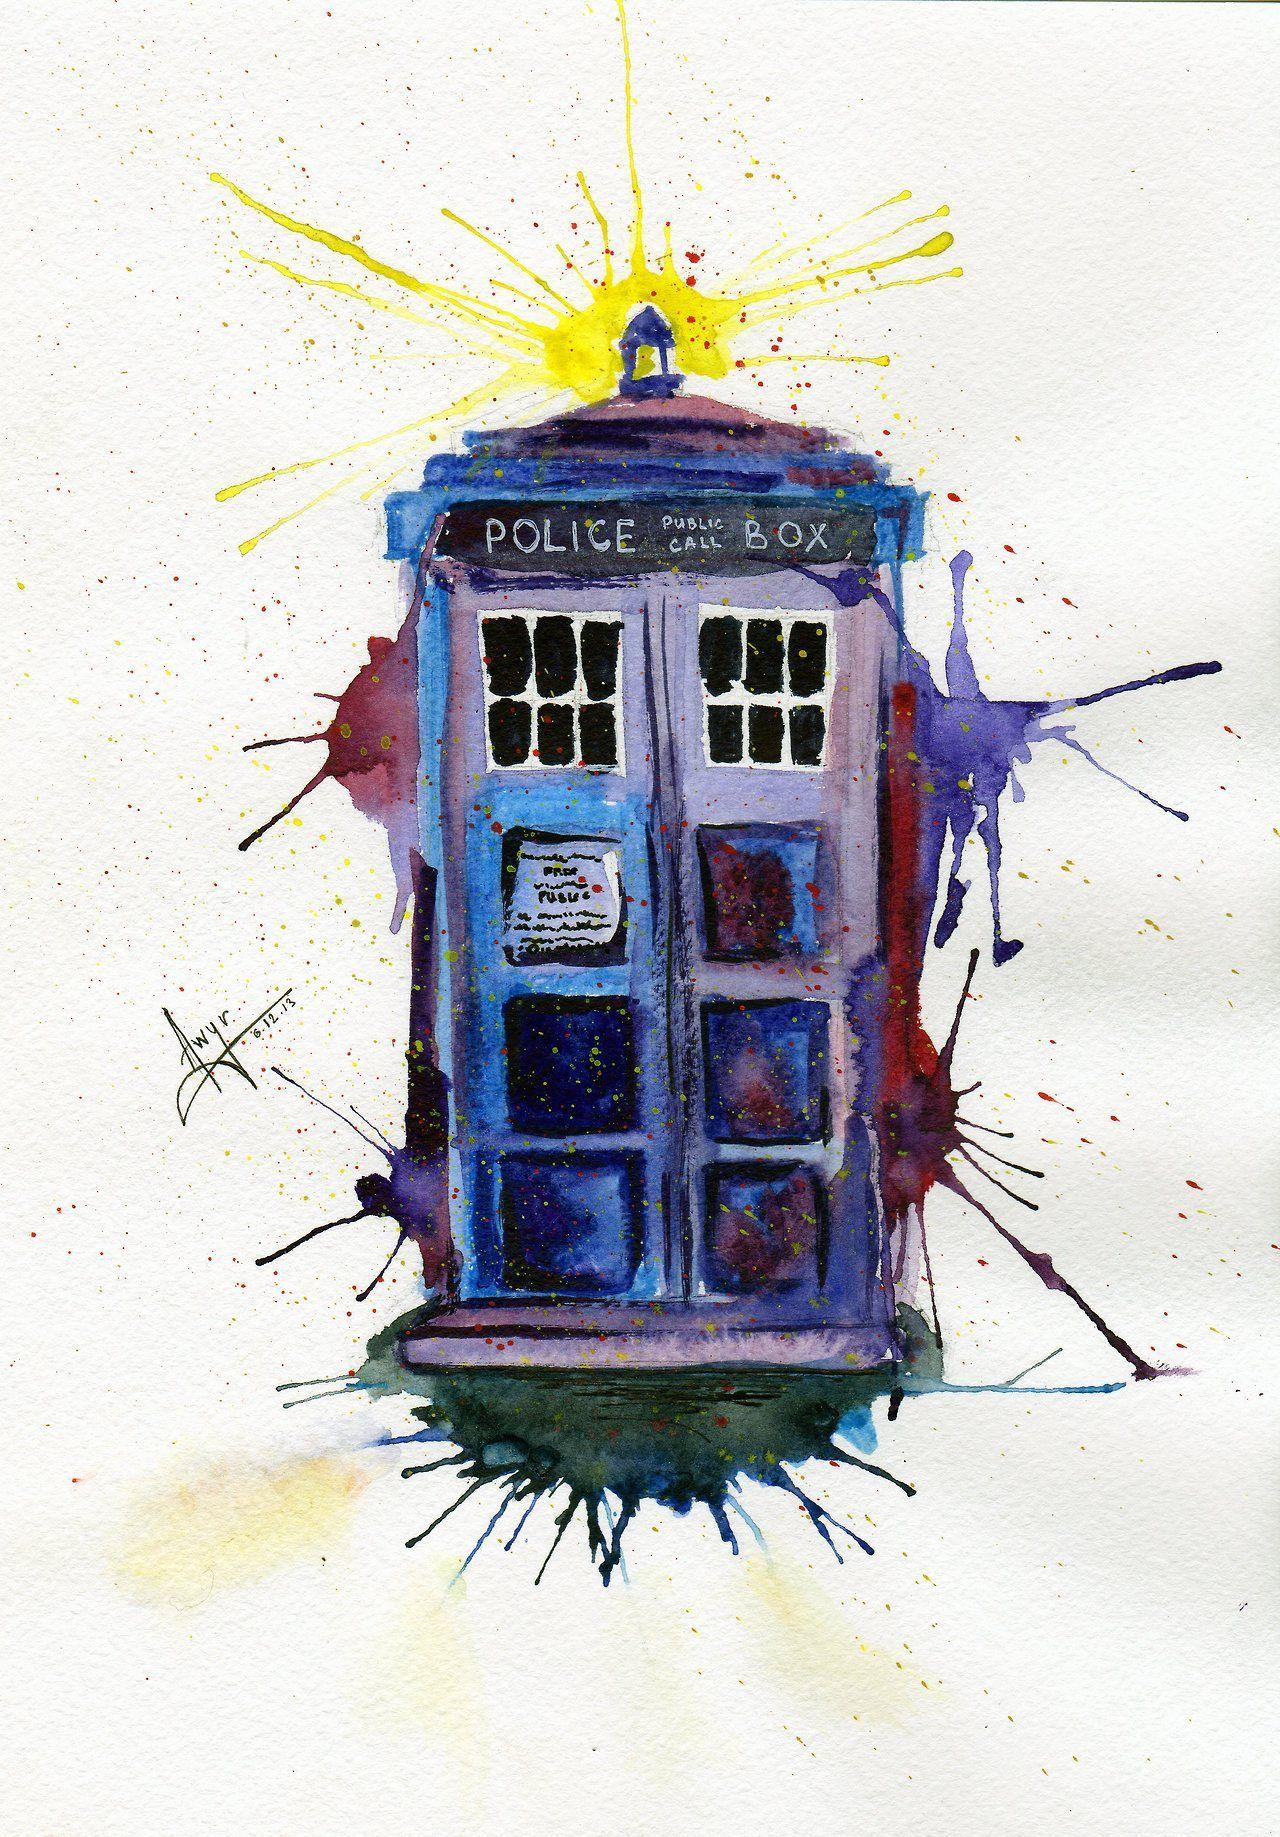 Doctor who tardis tardis pinterest geschenk - Tardis selber bauen ...